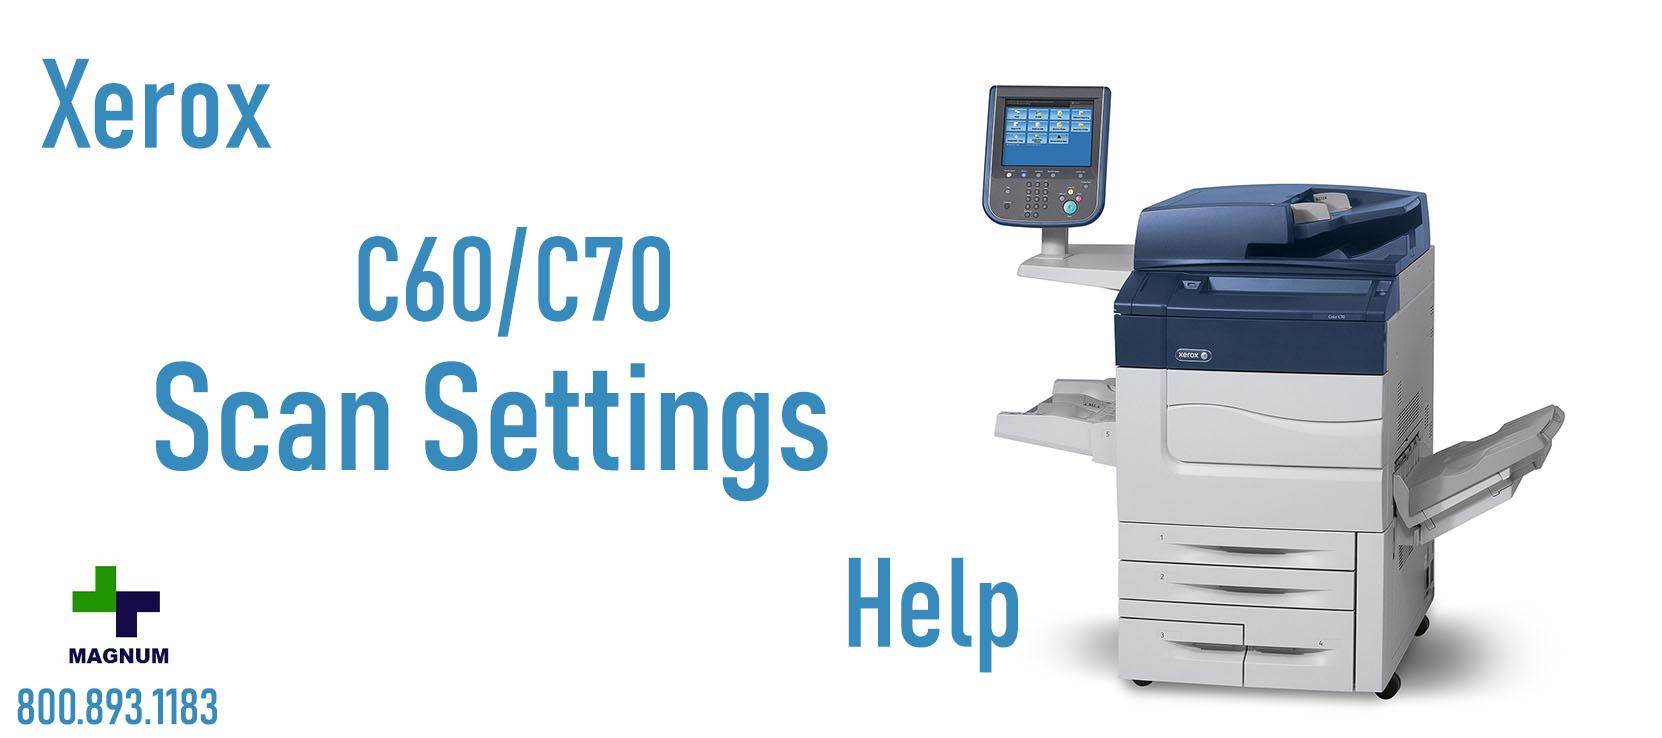 Xerox C60/C70 Help